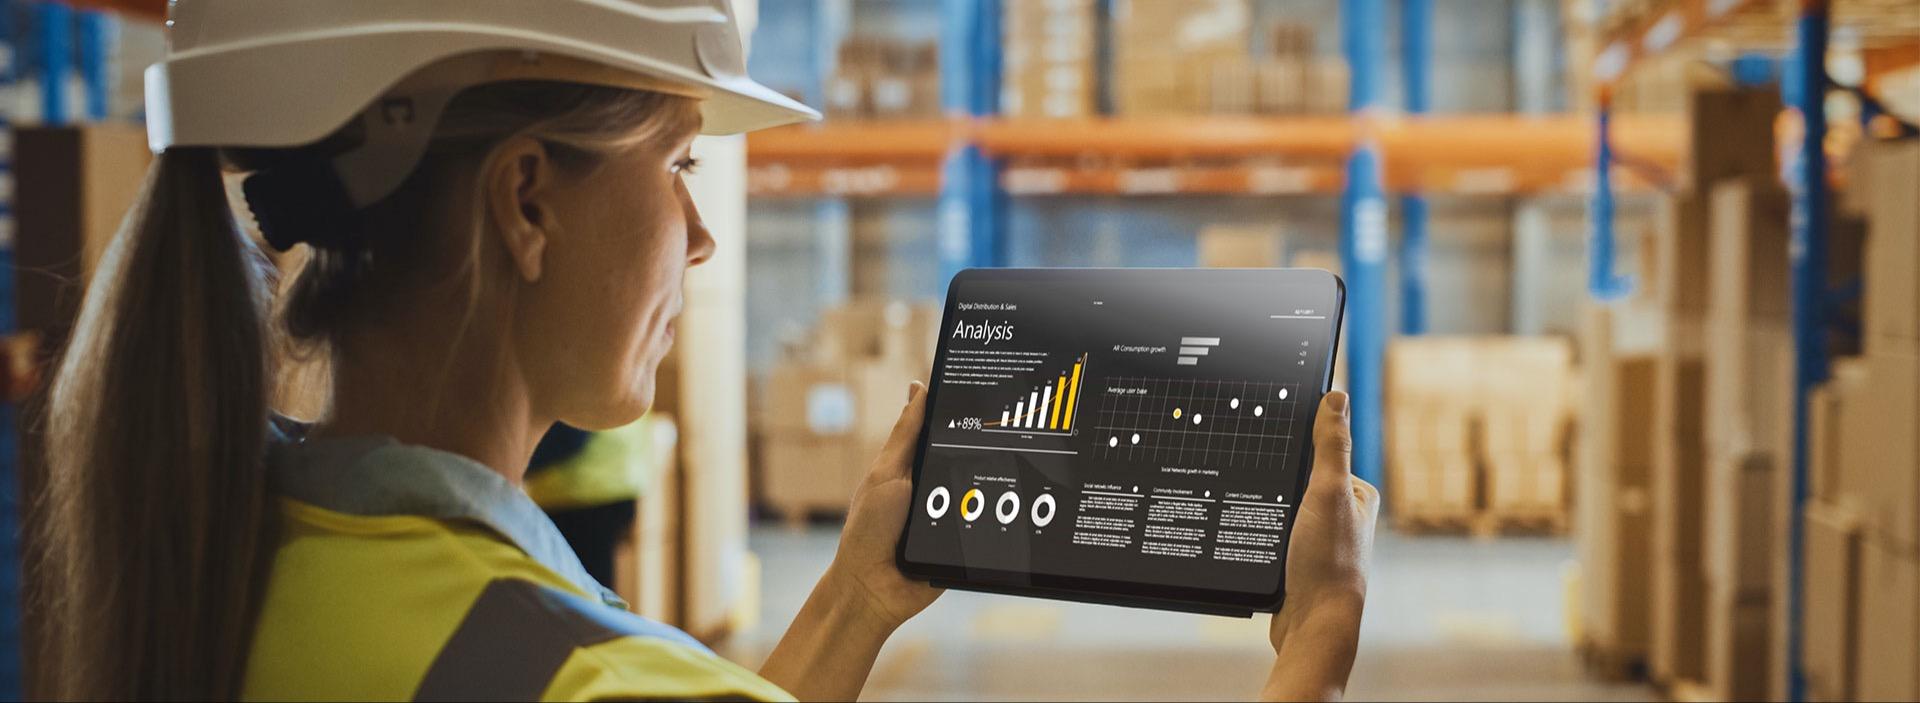 Inventory management software development: tips, trends, success stories